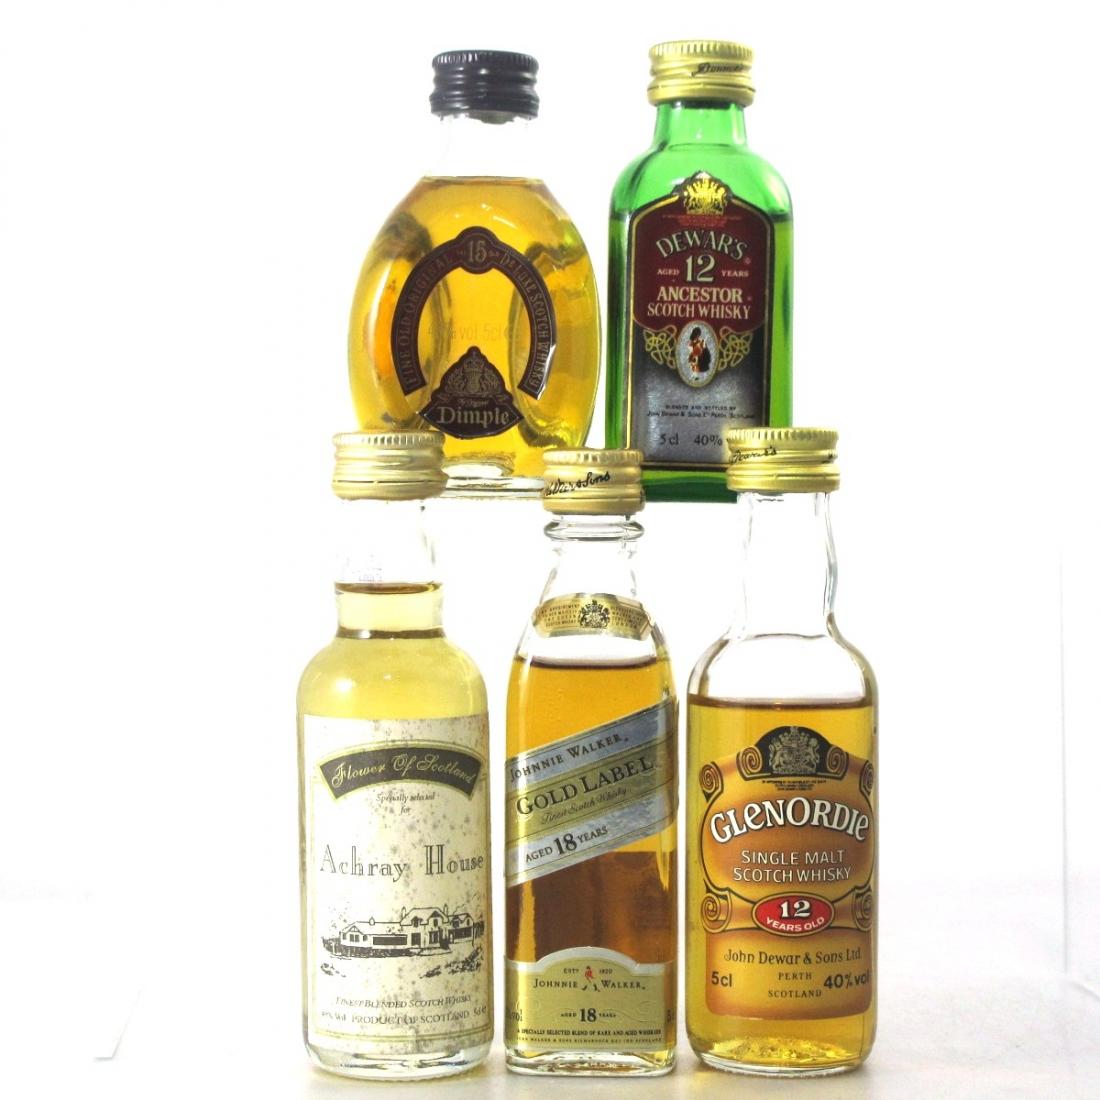 Blended Scotch Whisky Miniatures x 8 / Including Glenordie Single Malt